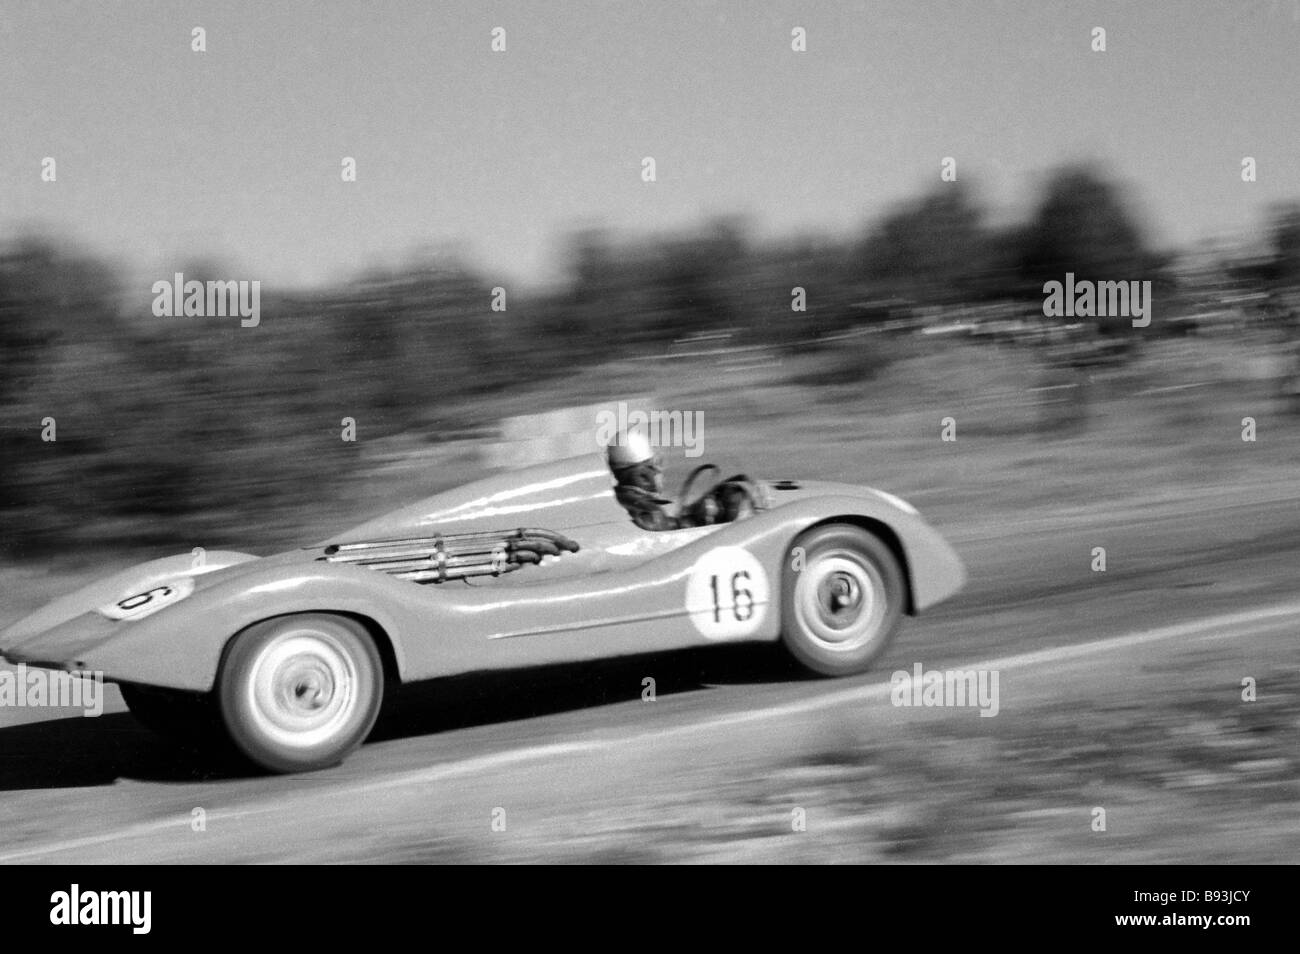 Yevgeny Veretov driving MZMA 1500 at 1959 national car racing championship on Minsk highway - Stock Image